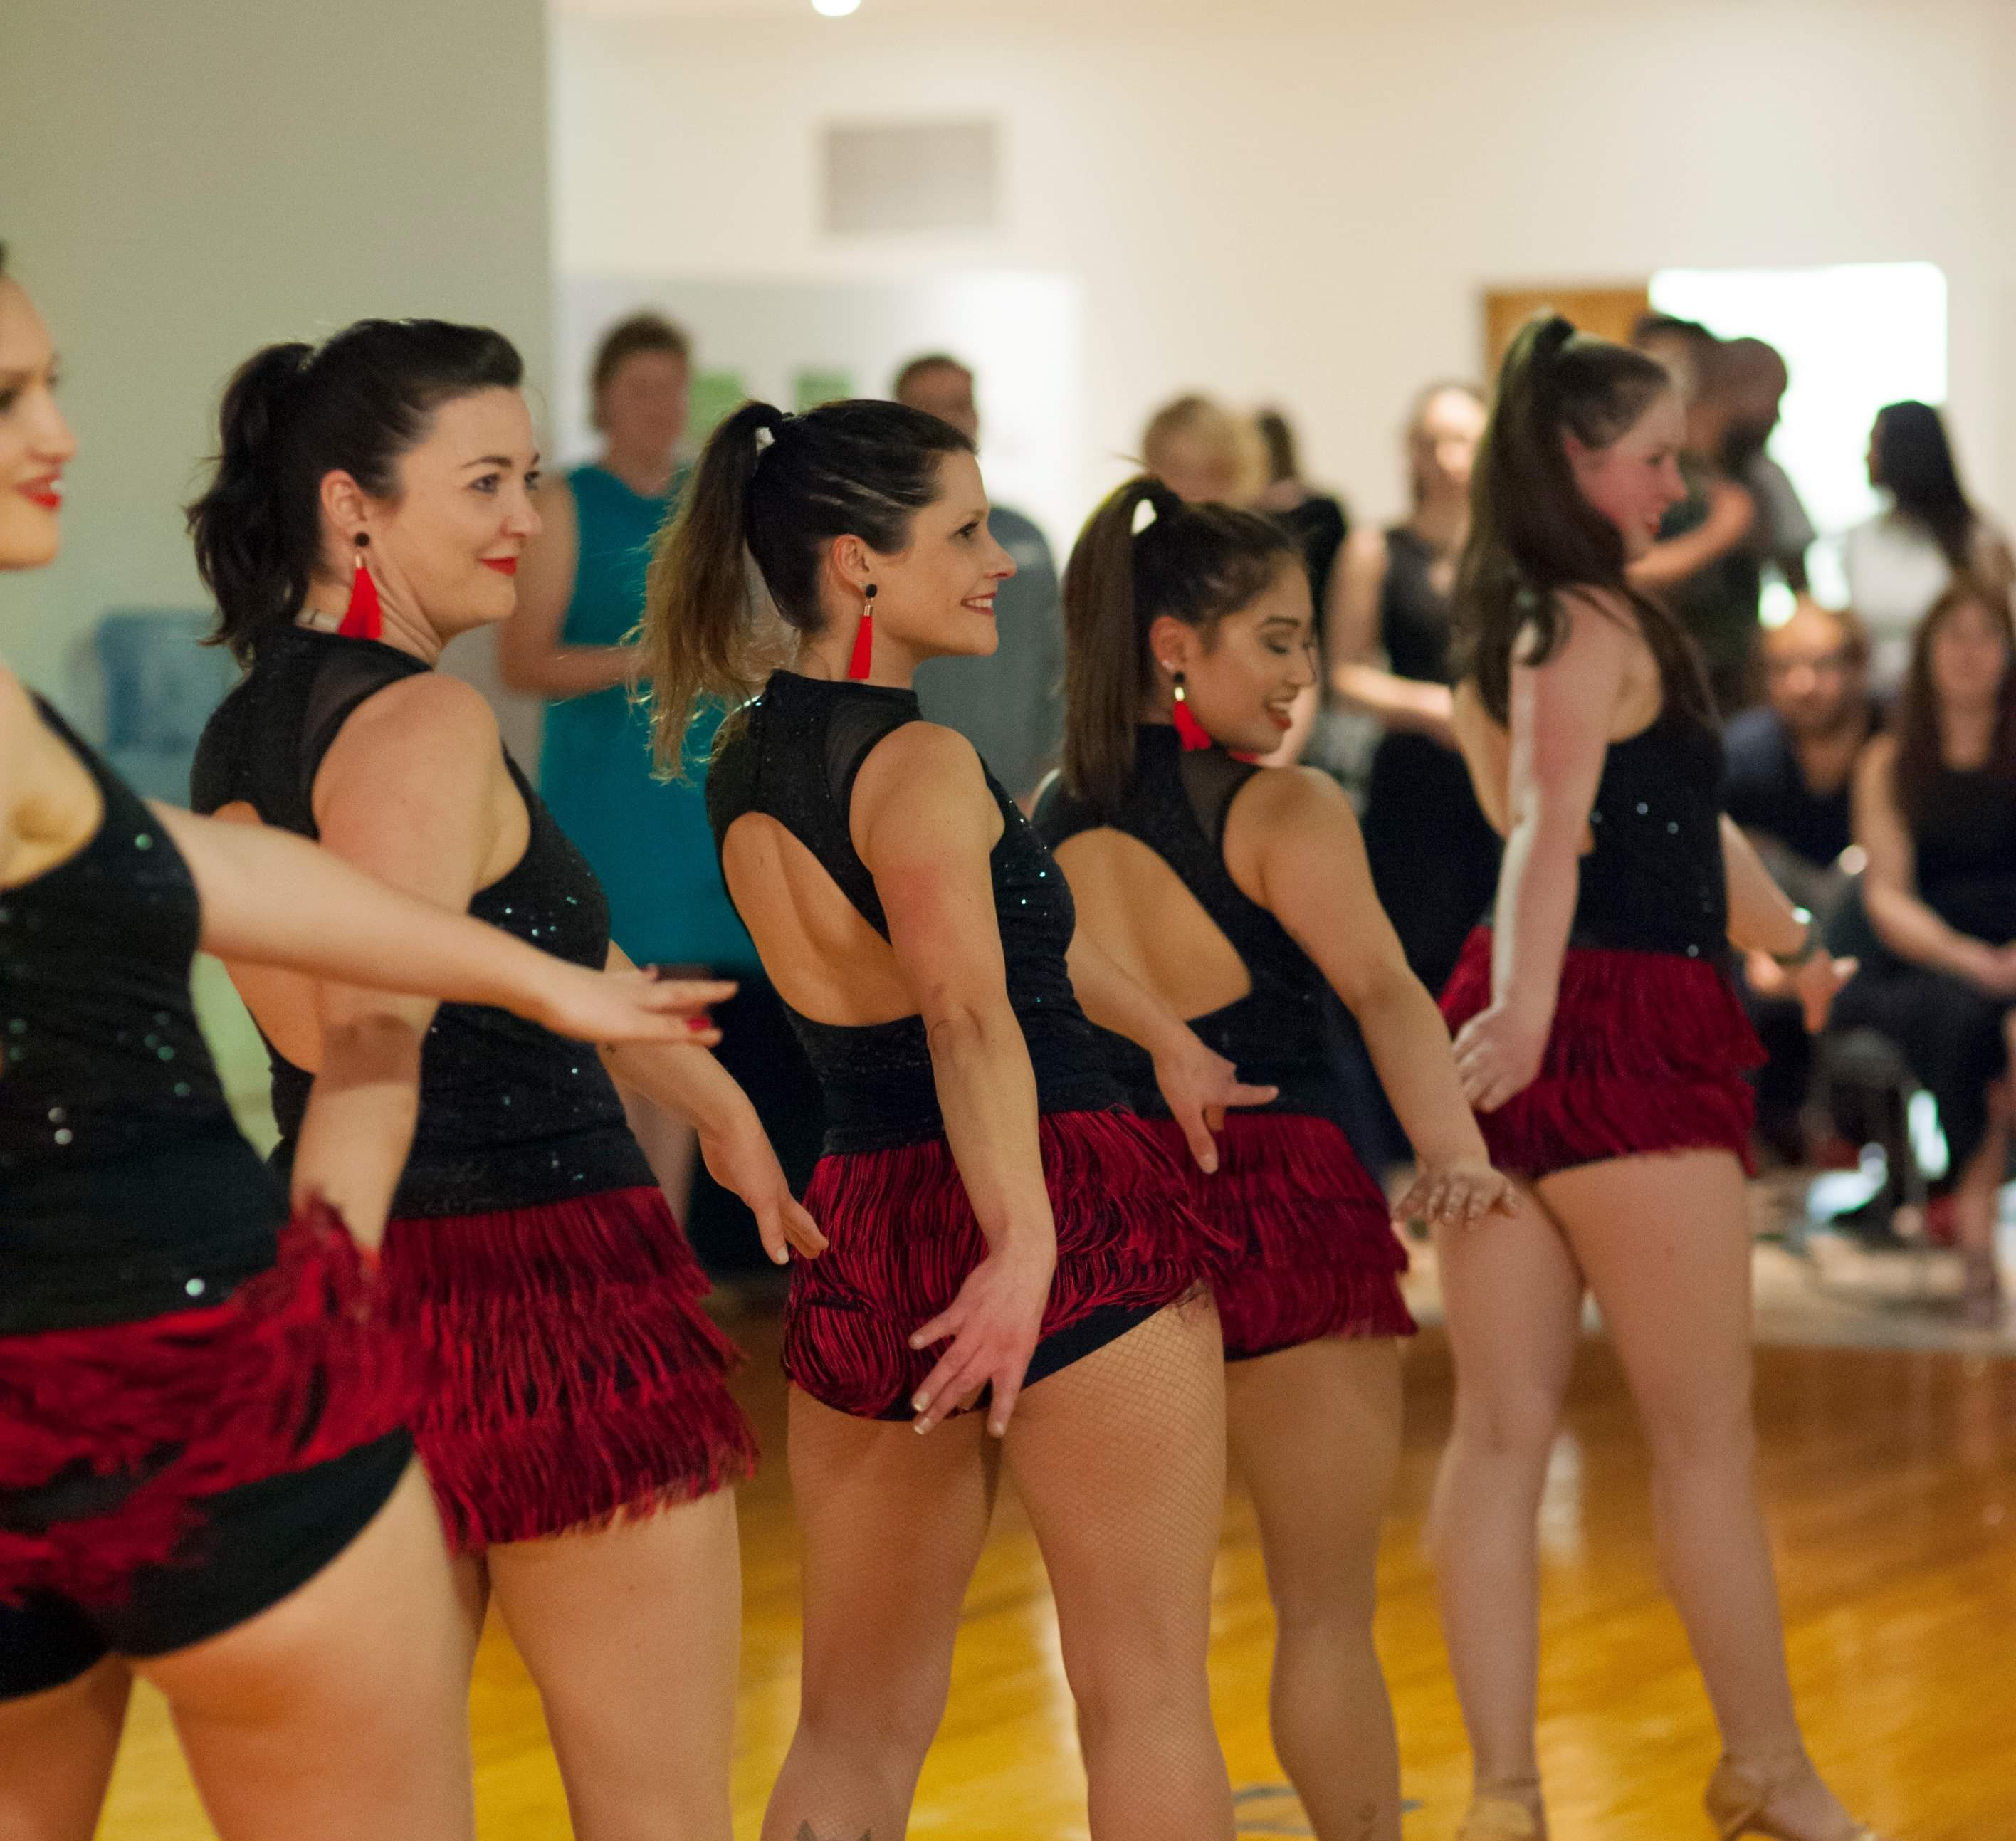 Salsa Club Dunedin's ladies team performing a vibrant and flamboyant Cha Cha routine.